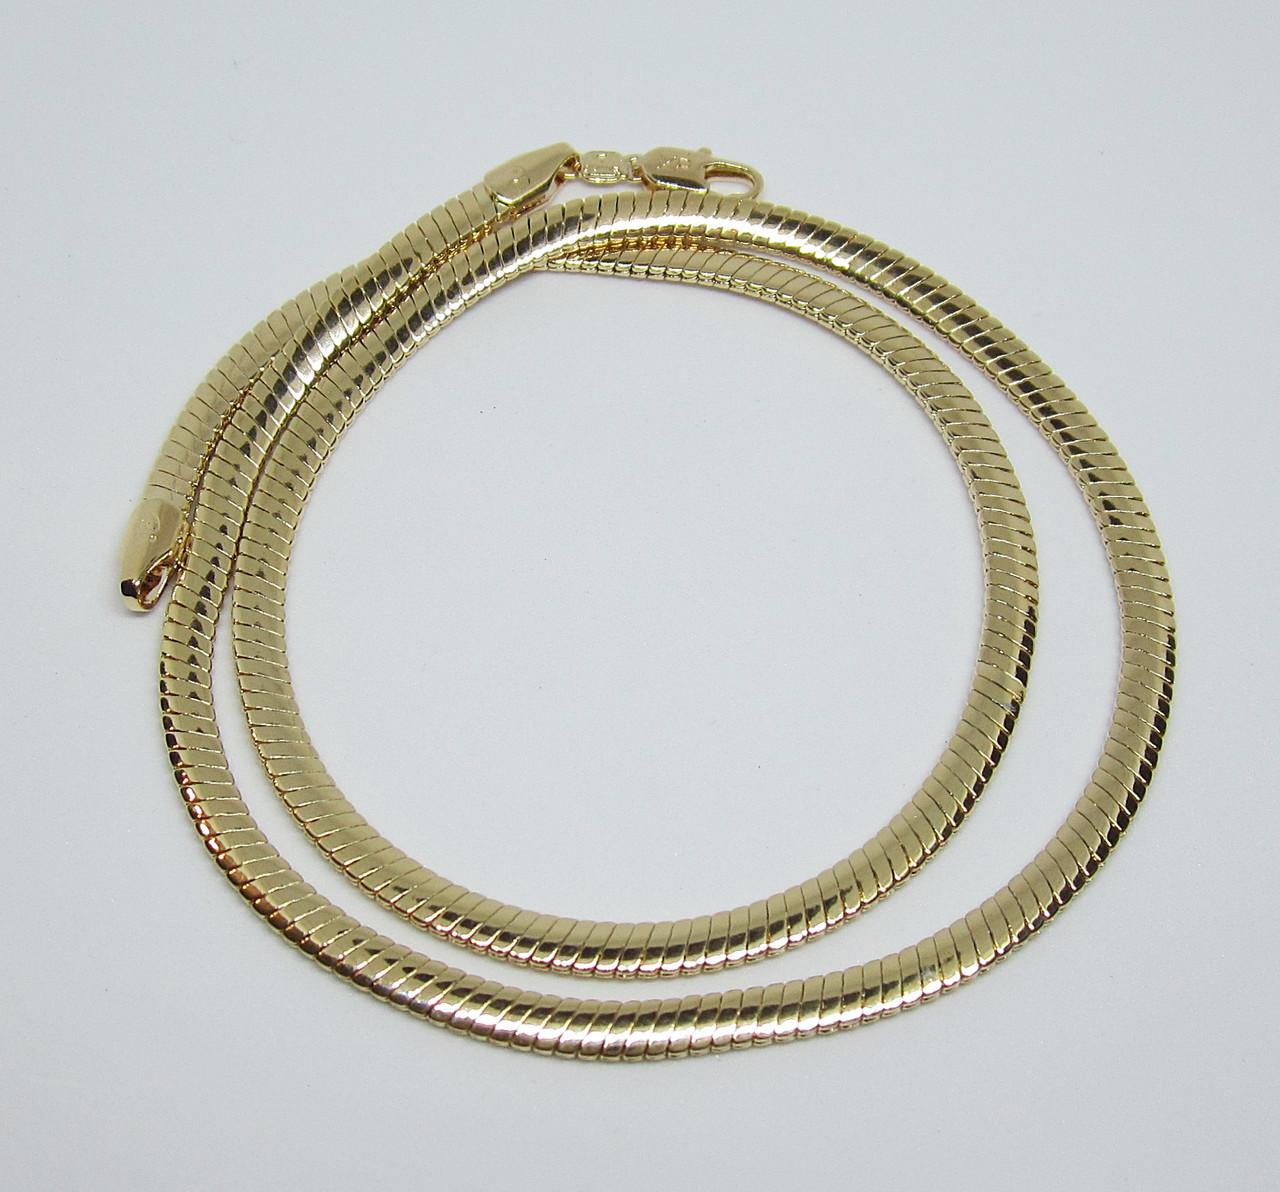 Цепочка плетение Париджина длина 50 см ширина 0.4